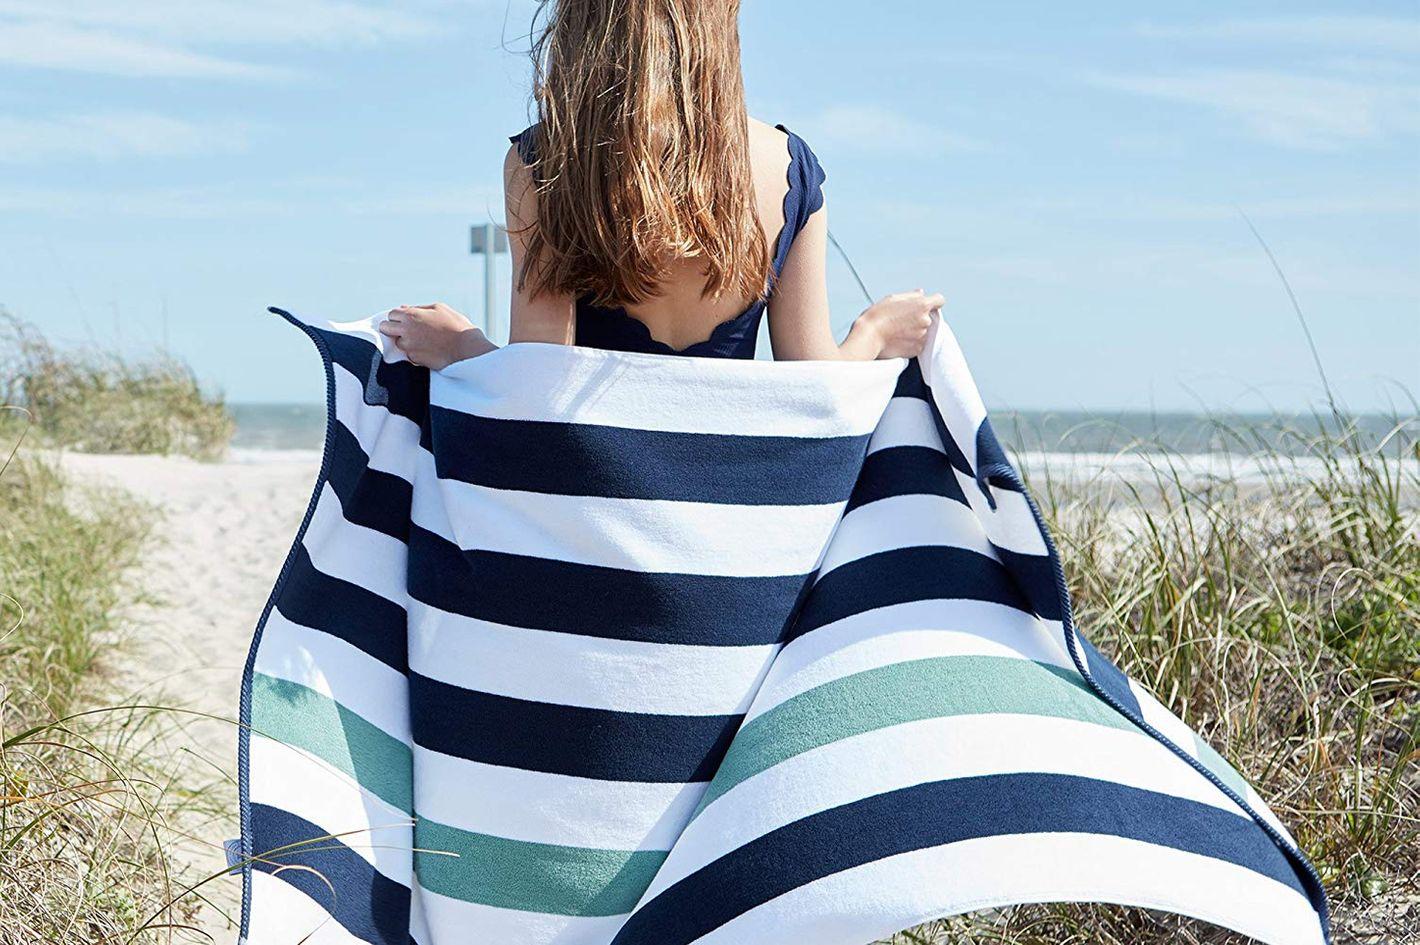 Swimming Pools & Hot Tubs Headrest Headrest Folding Light Towel Beach Pool Beach Headrest A Great Variety Of Models